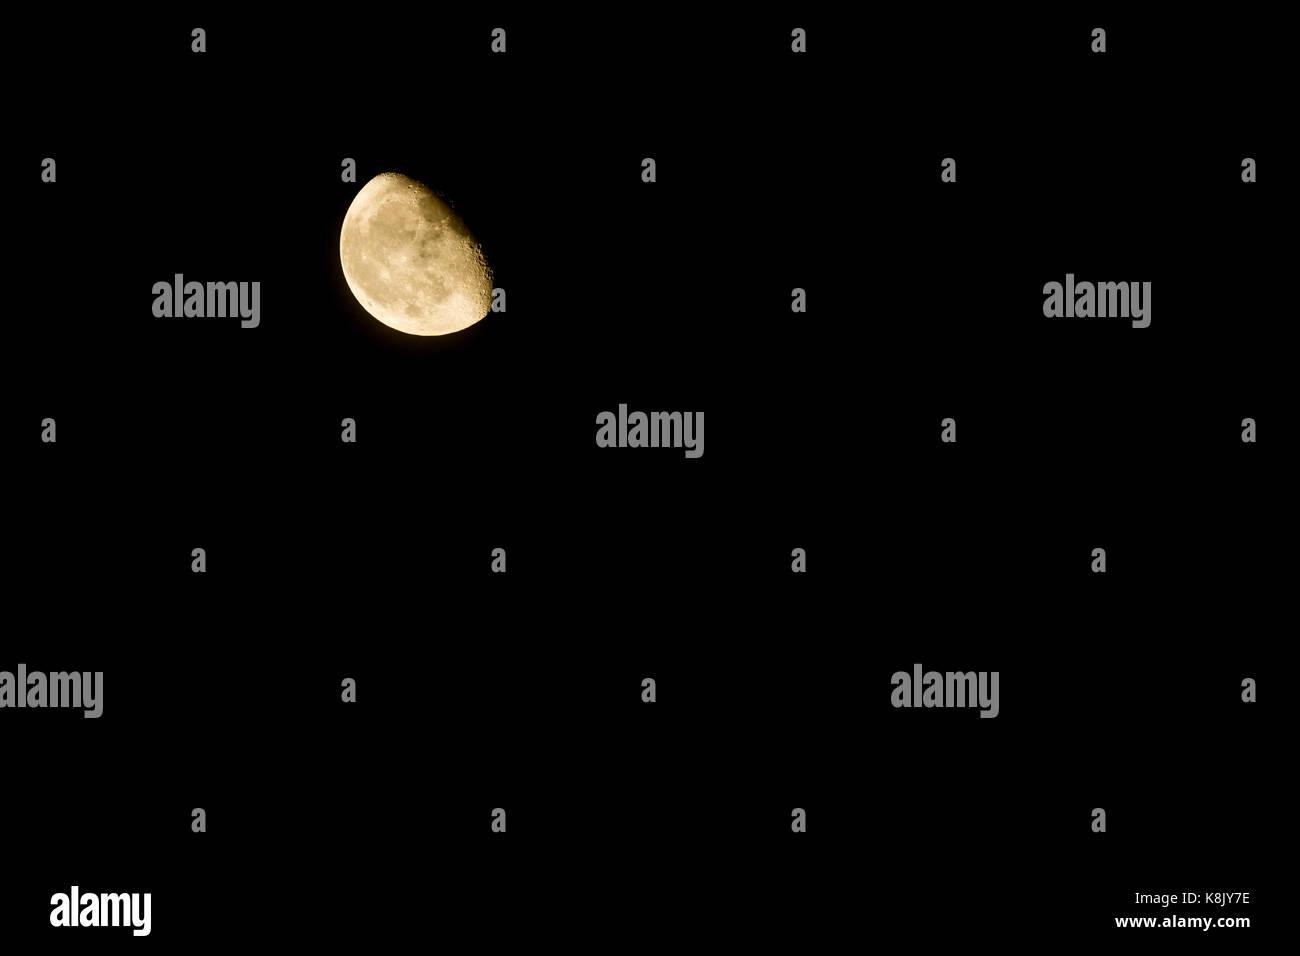 Cuarto menguante Foto & Imagen De Stock: 160227074 - Alamy